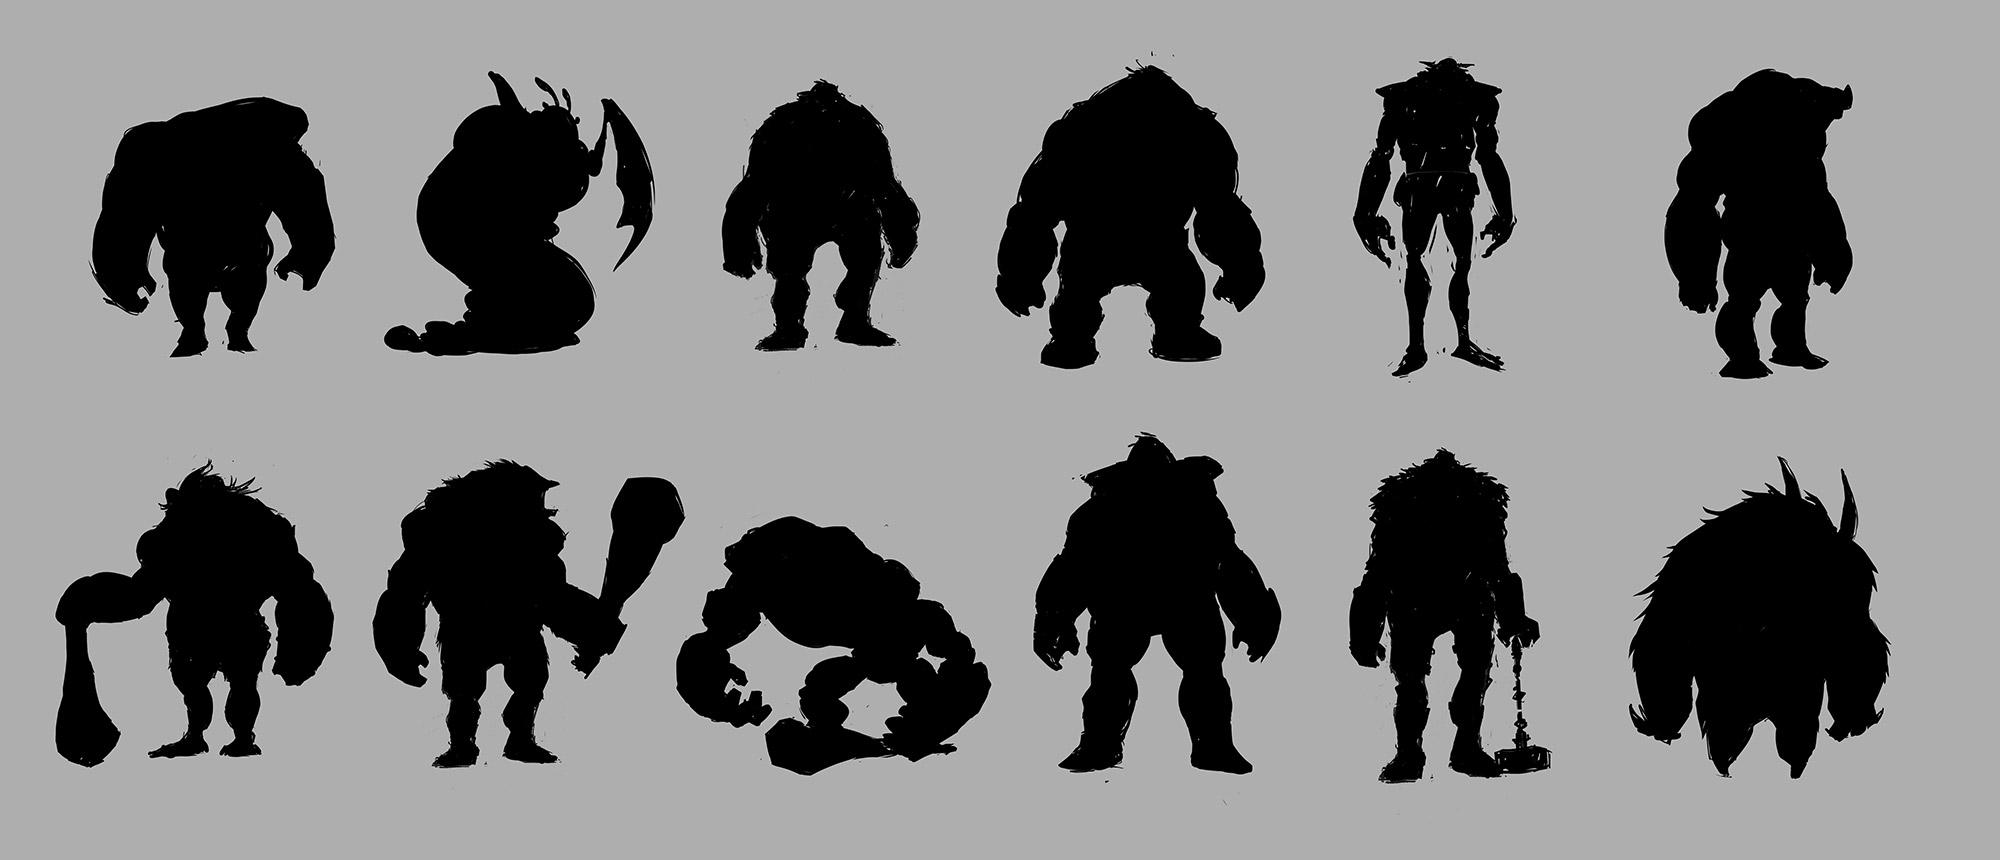 rinowenger_silhouettes_giant